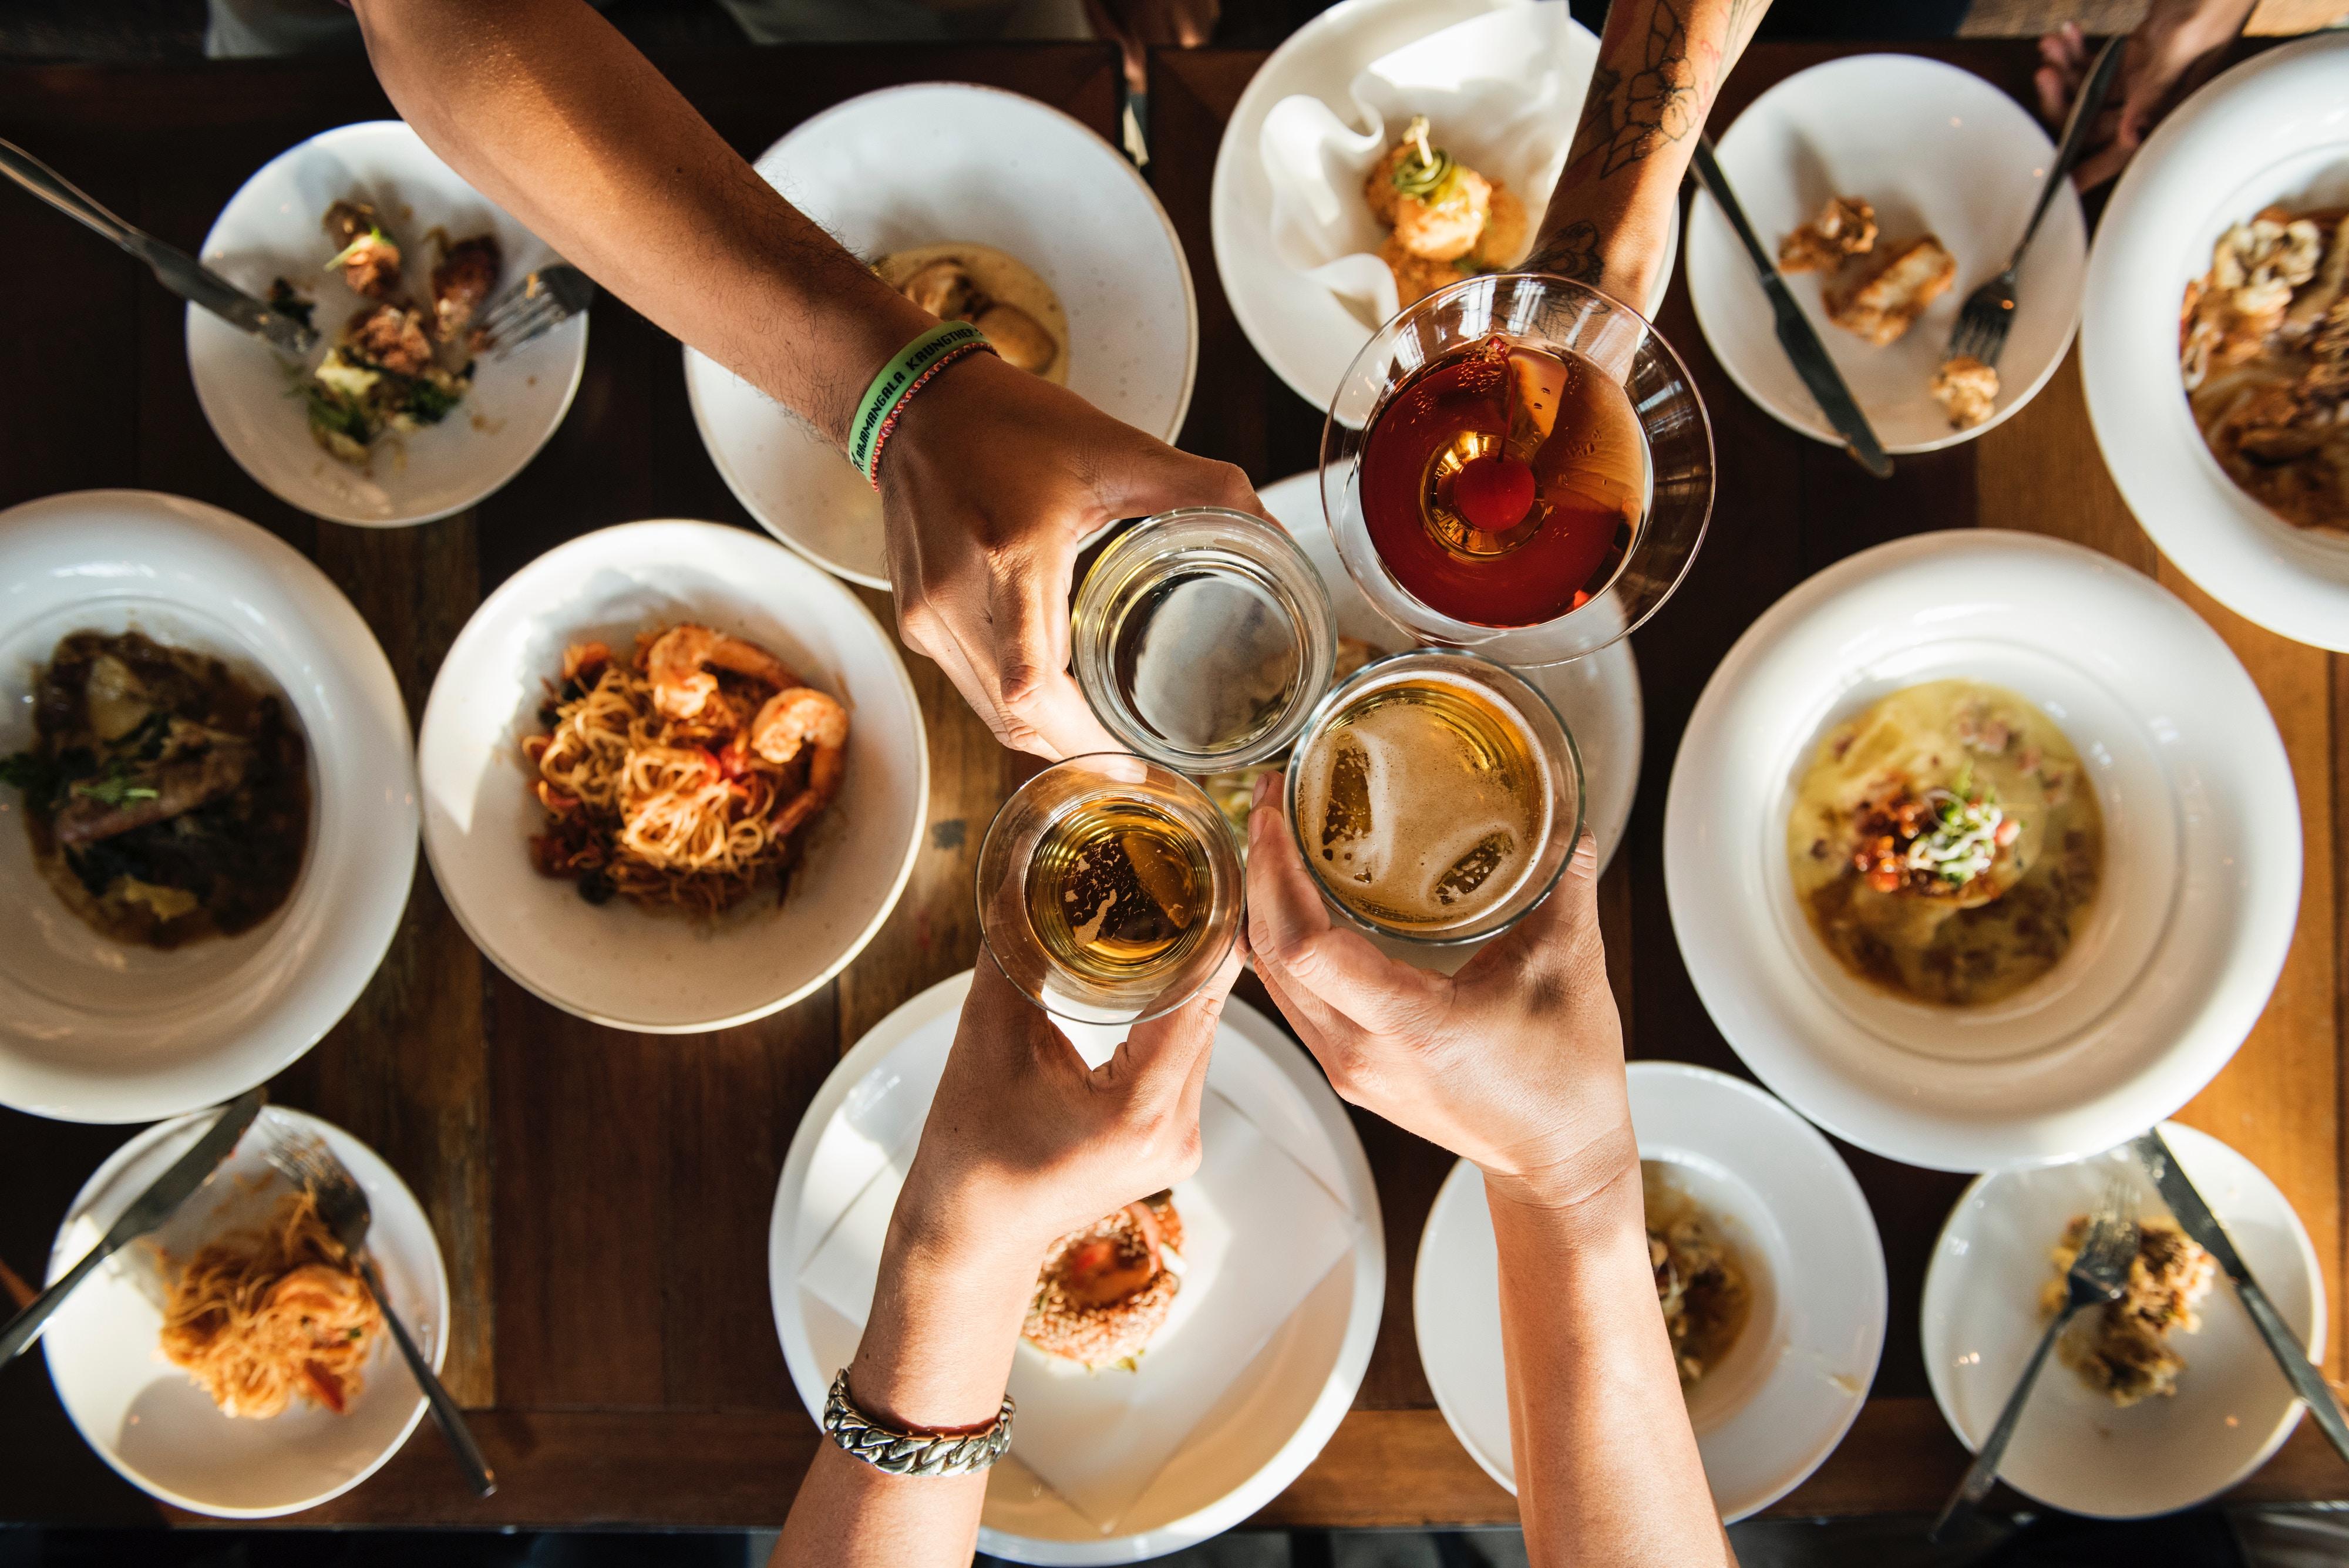 5 Easy Friendsgiving Recipes: Impress Your Friends